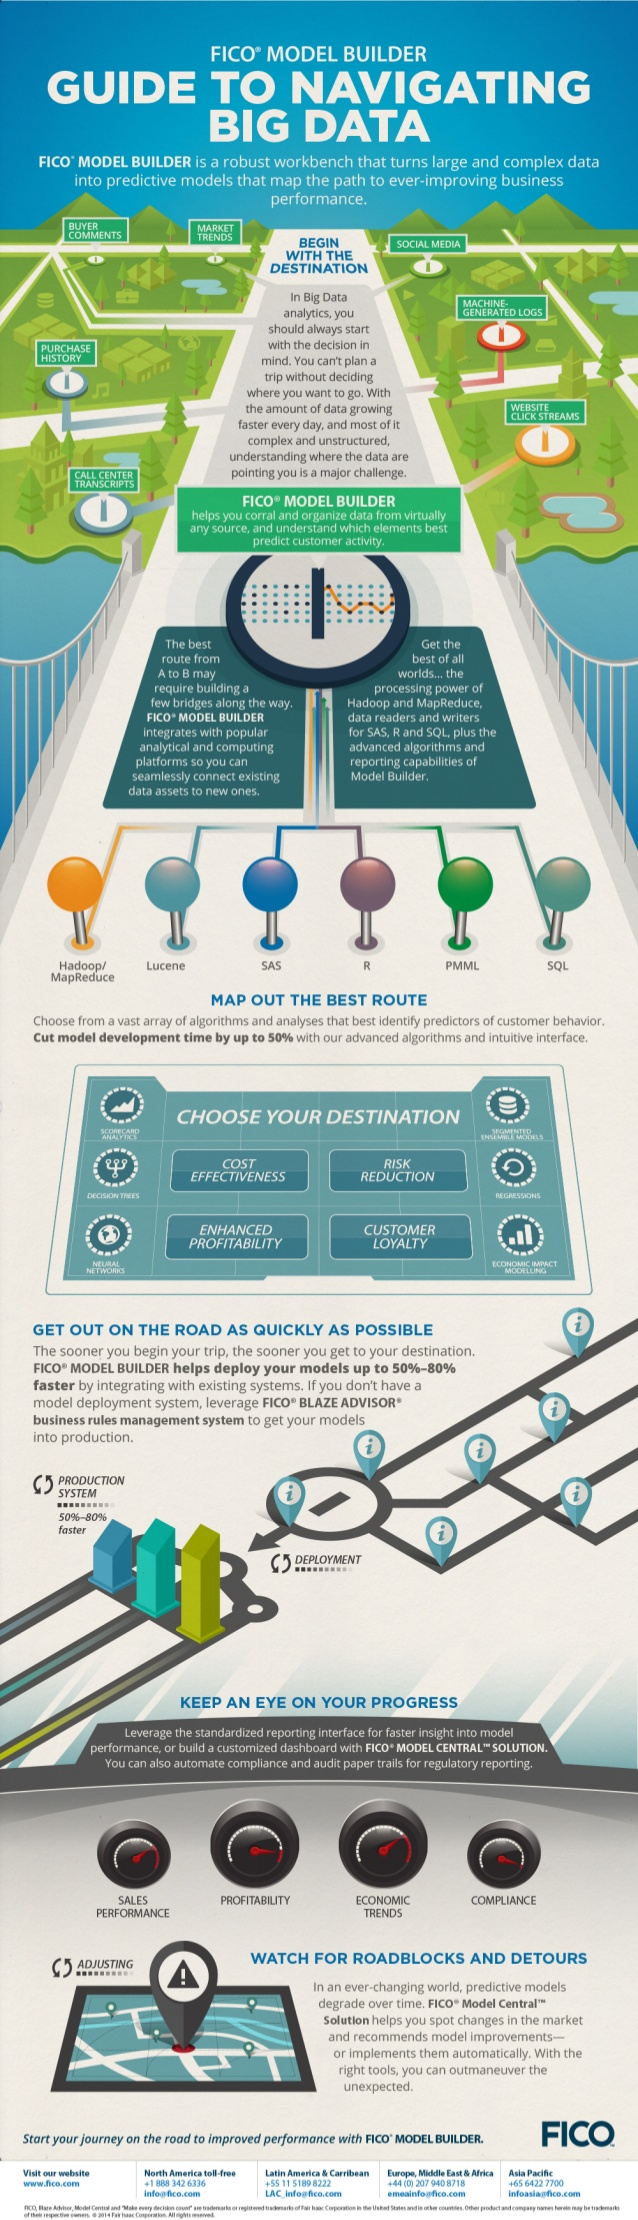 Guía para navegar en Big Data